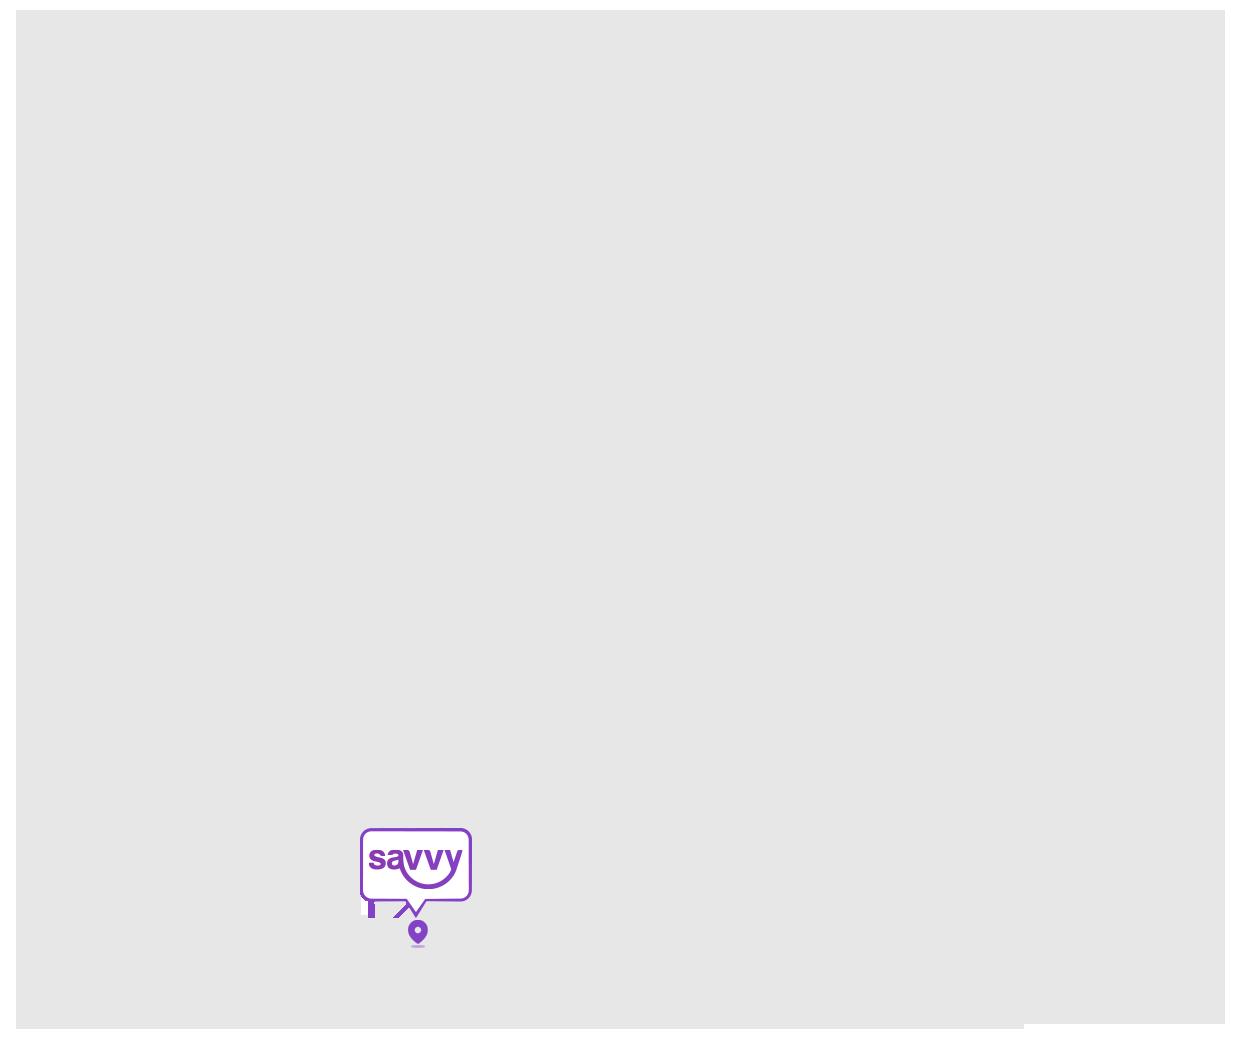 savvy technologies location map image